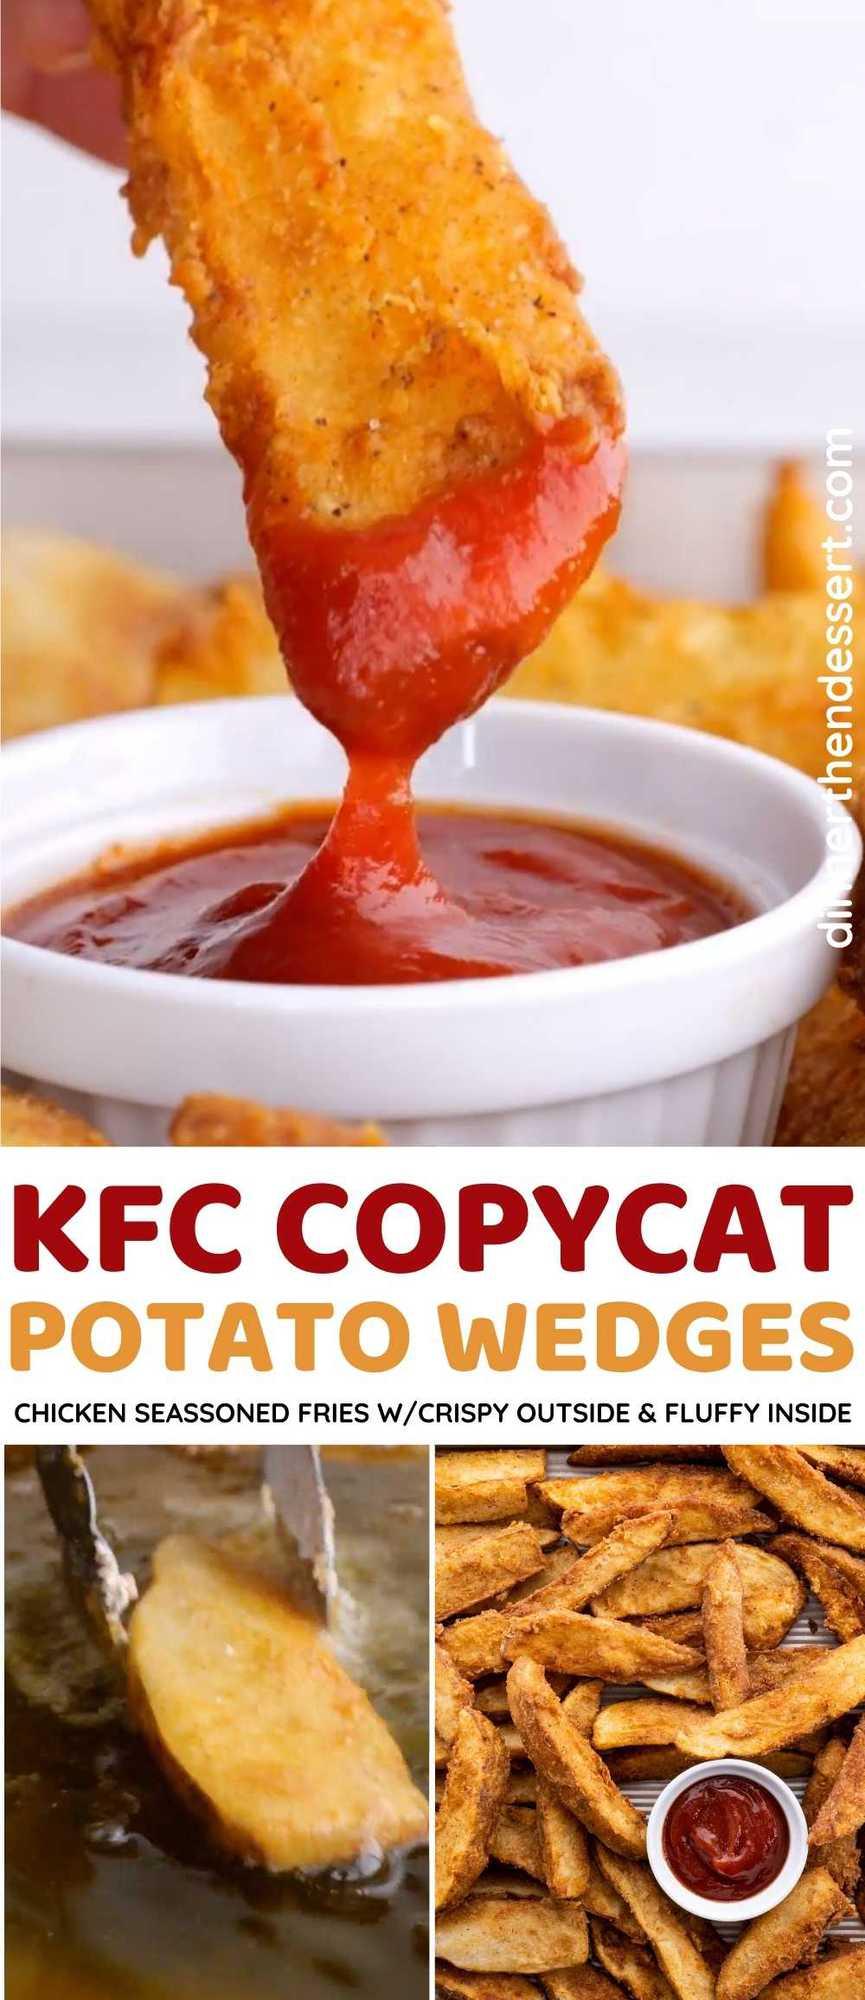 KFC Potato Wedges Copycat Collage